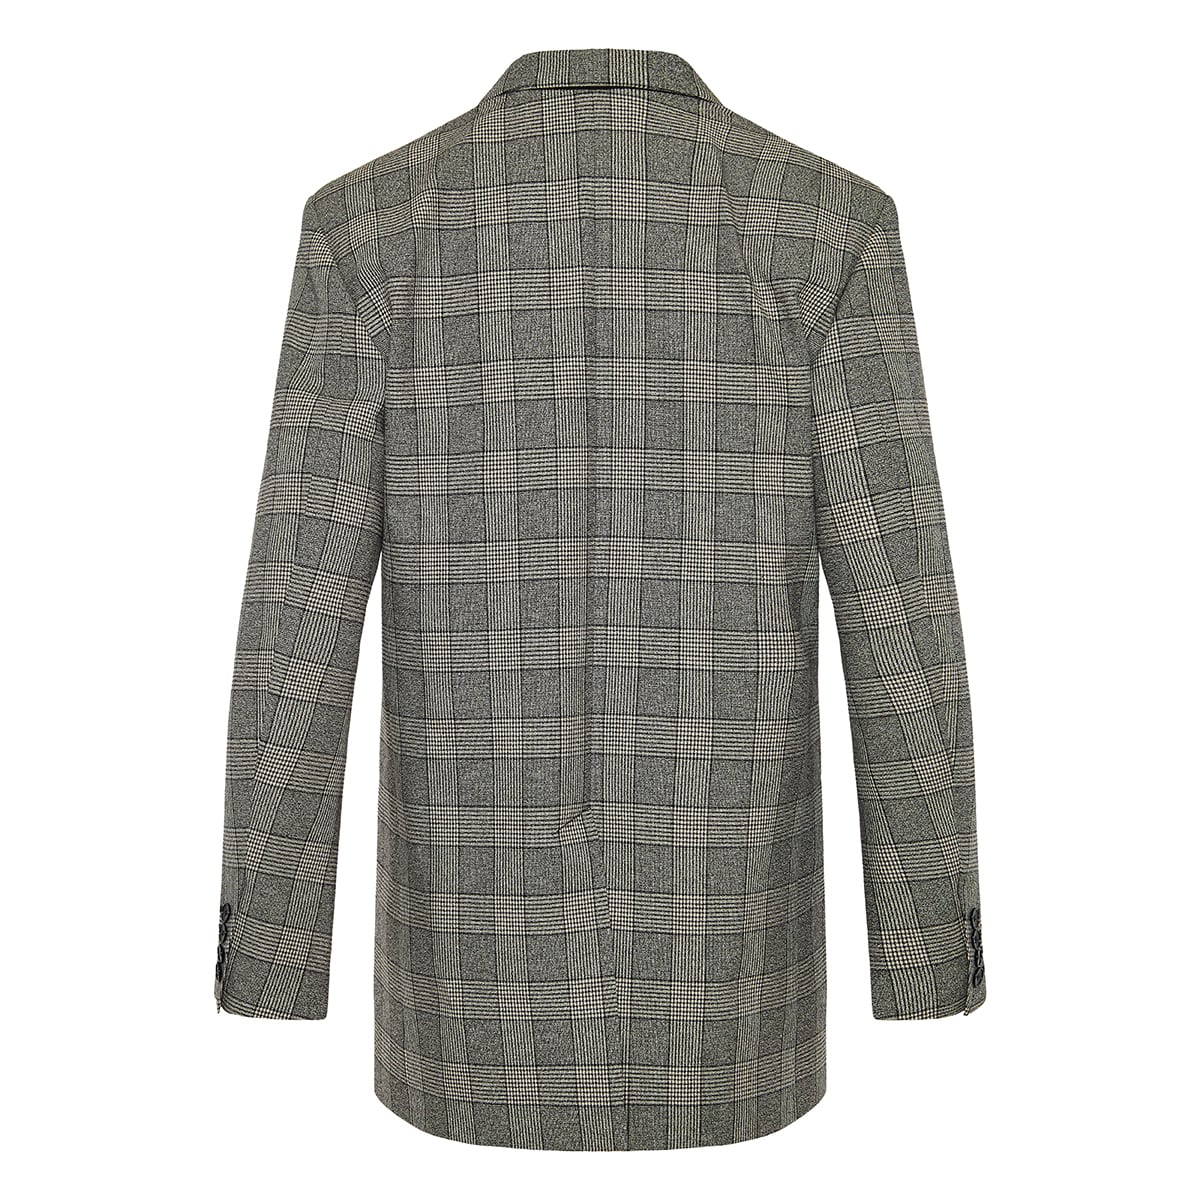 Oladim oversized checked blazer